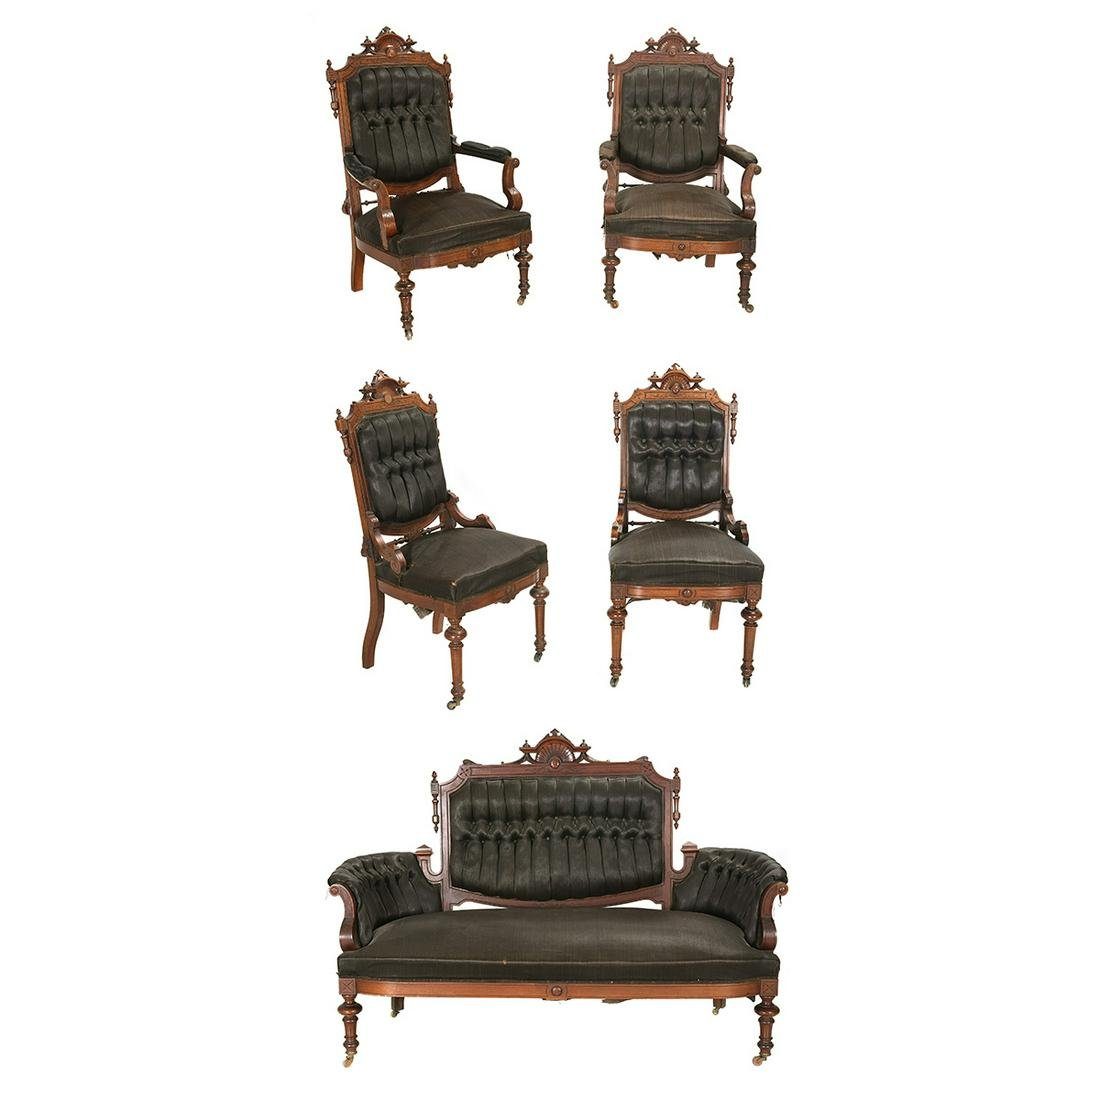 American Renaissance Revival Mahogany Furniture Suite.